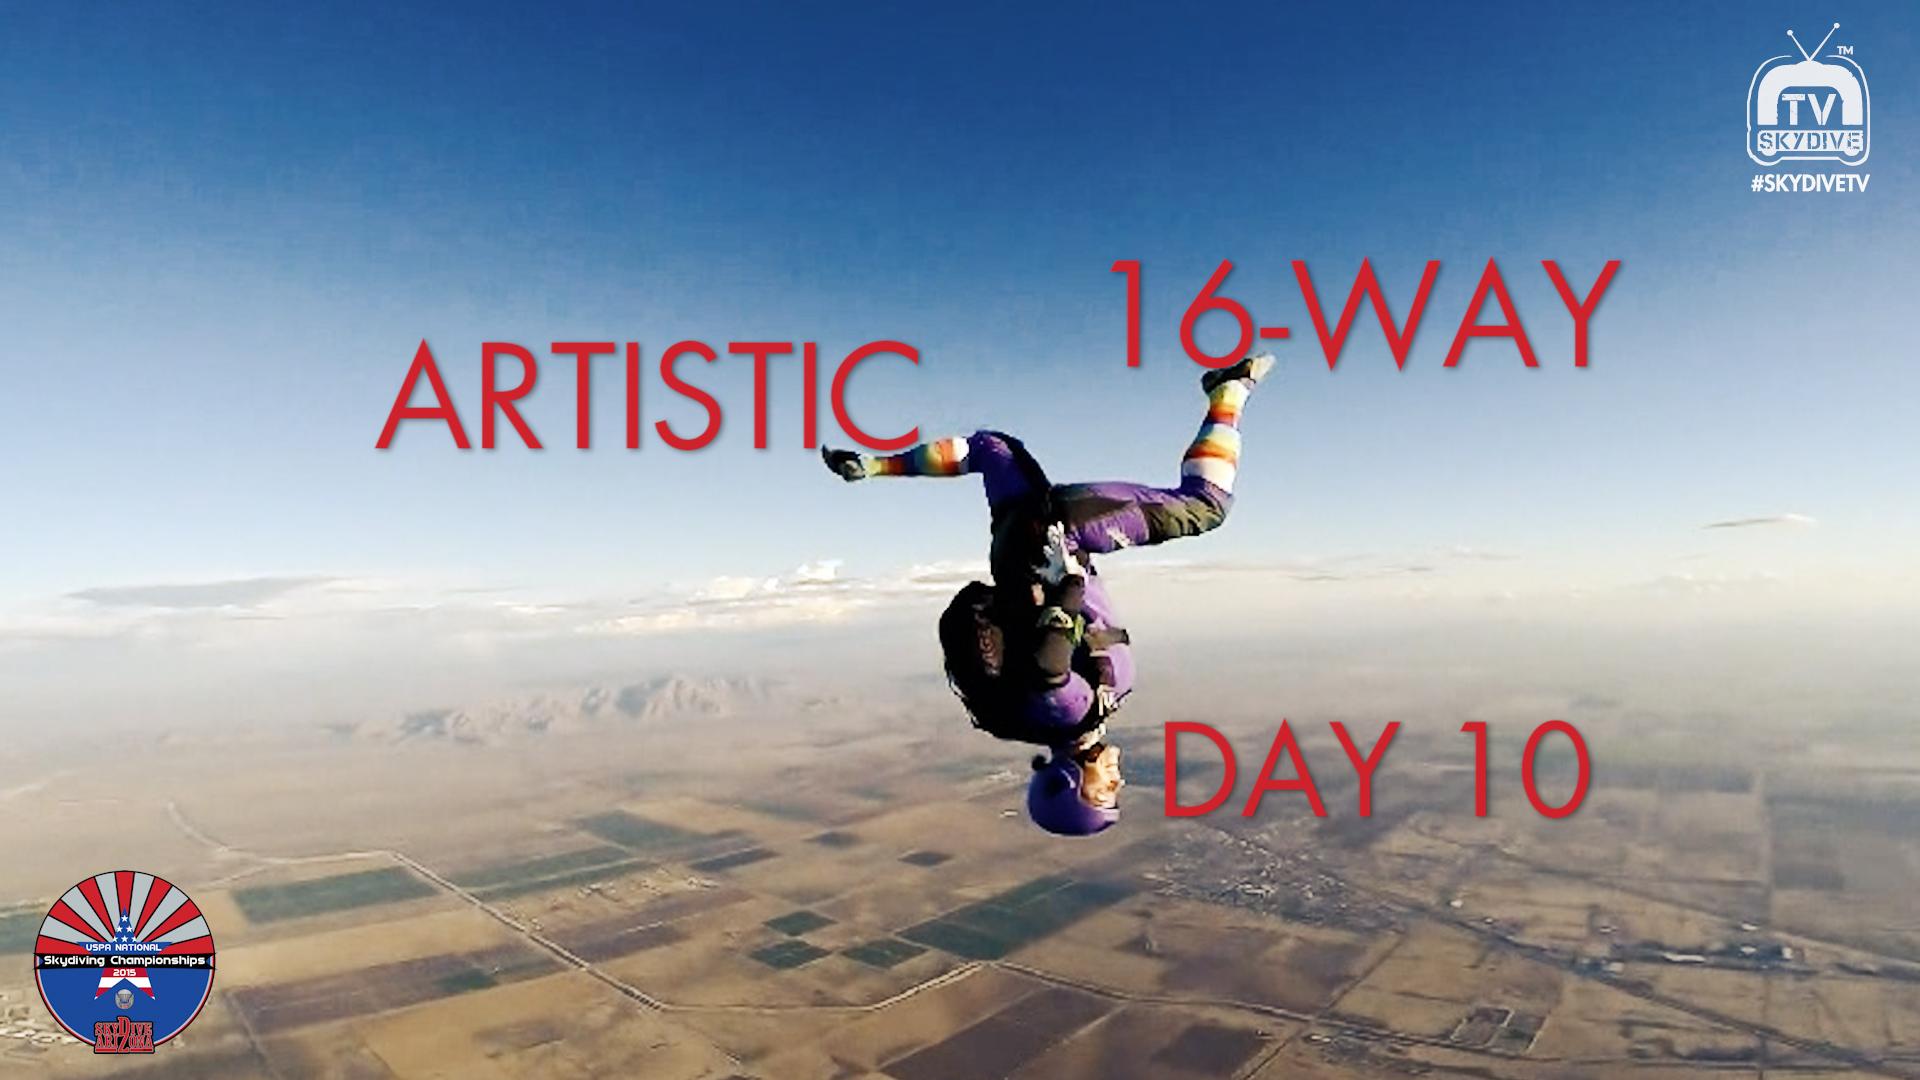 16 WAY, ARTISTIC